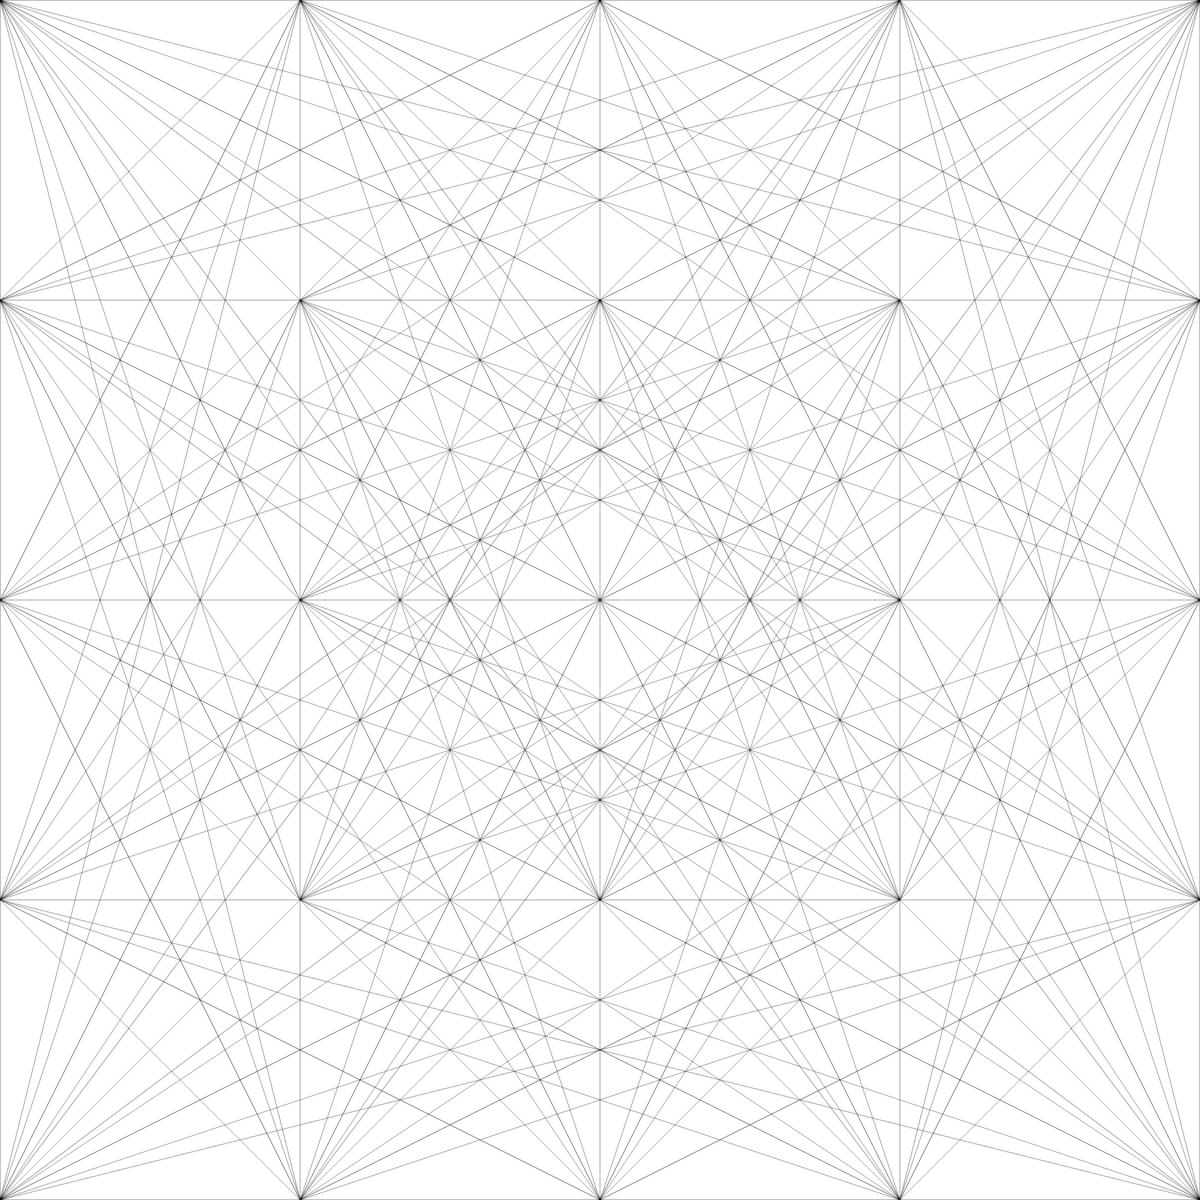 f:id:Hassium277:20200217210750p:plain